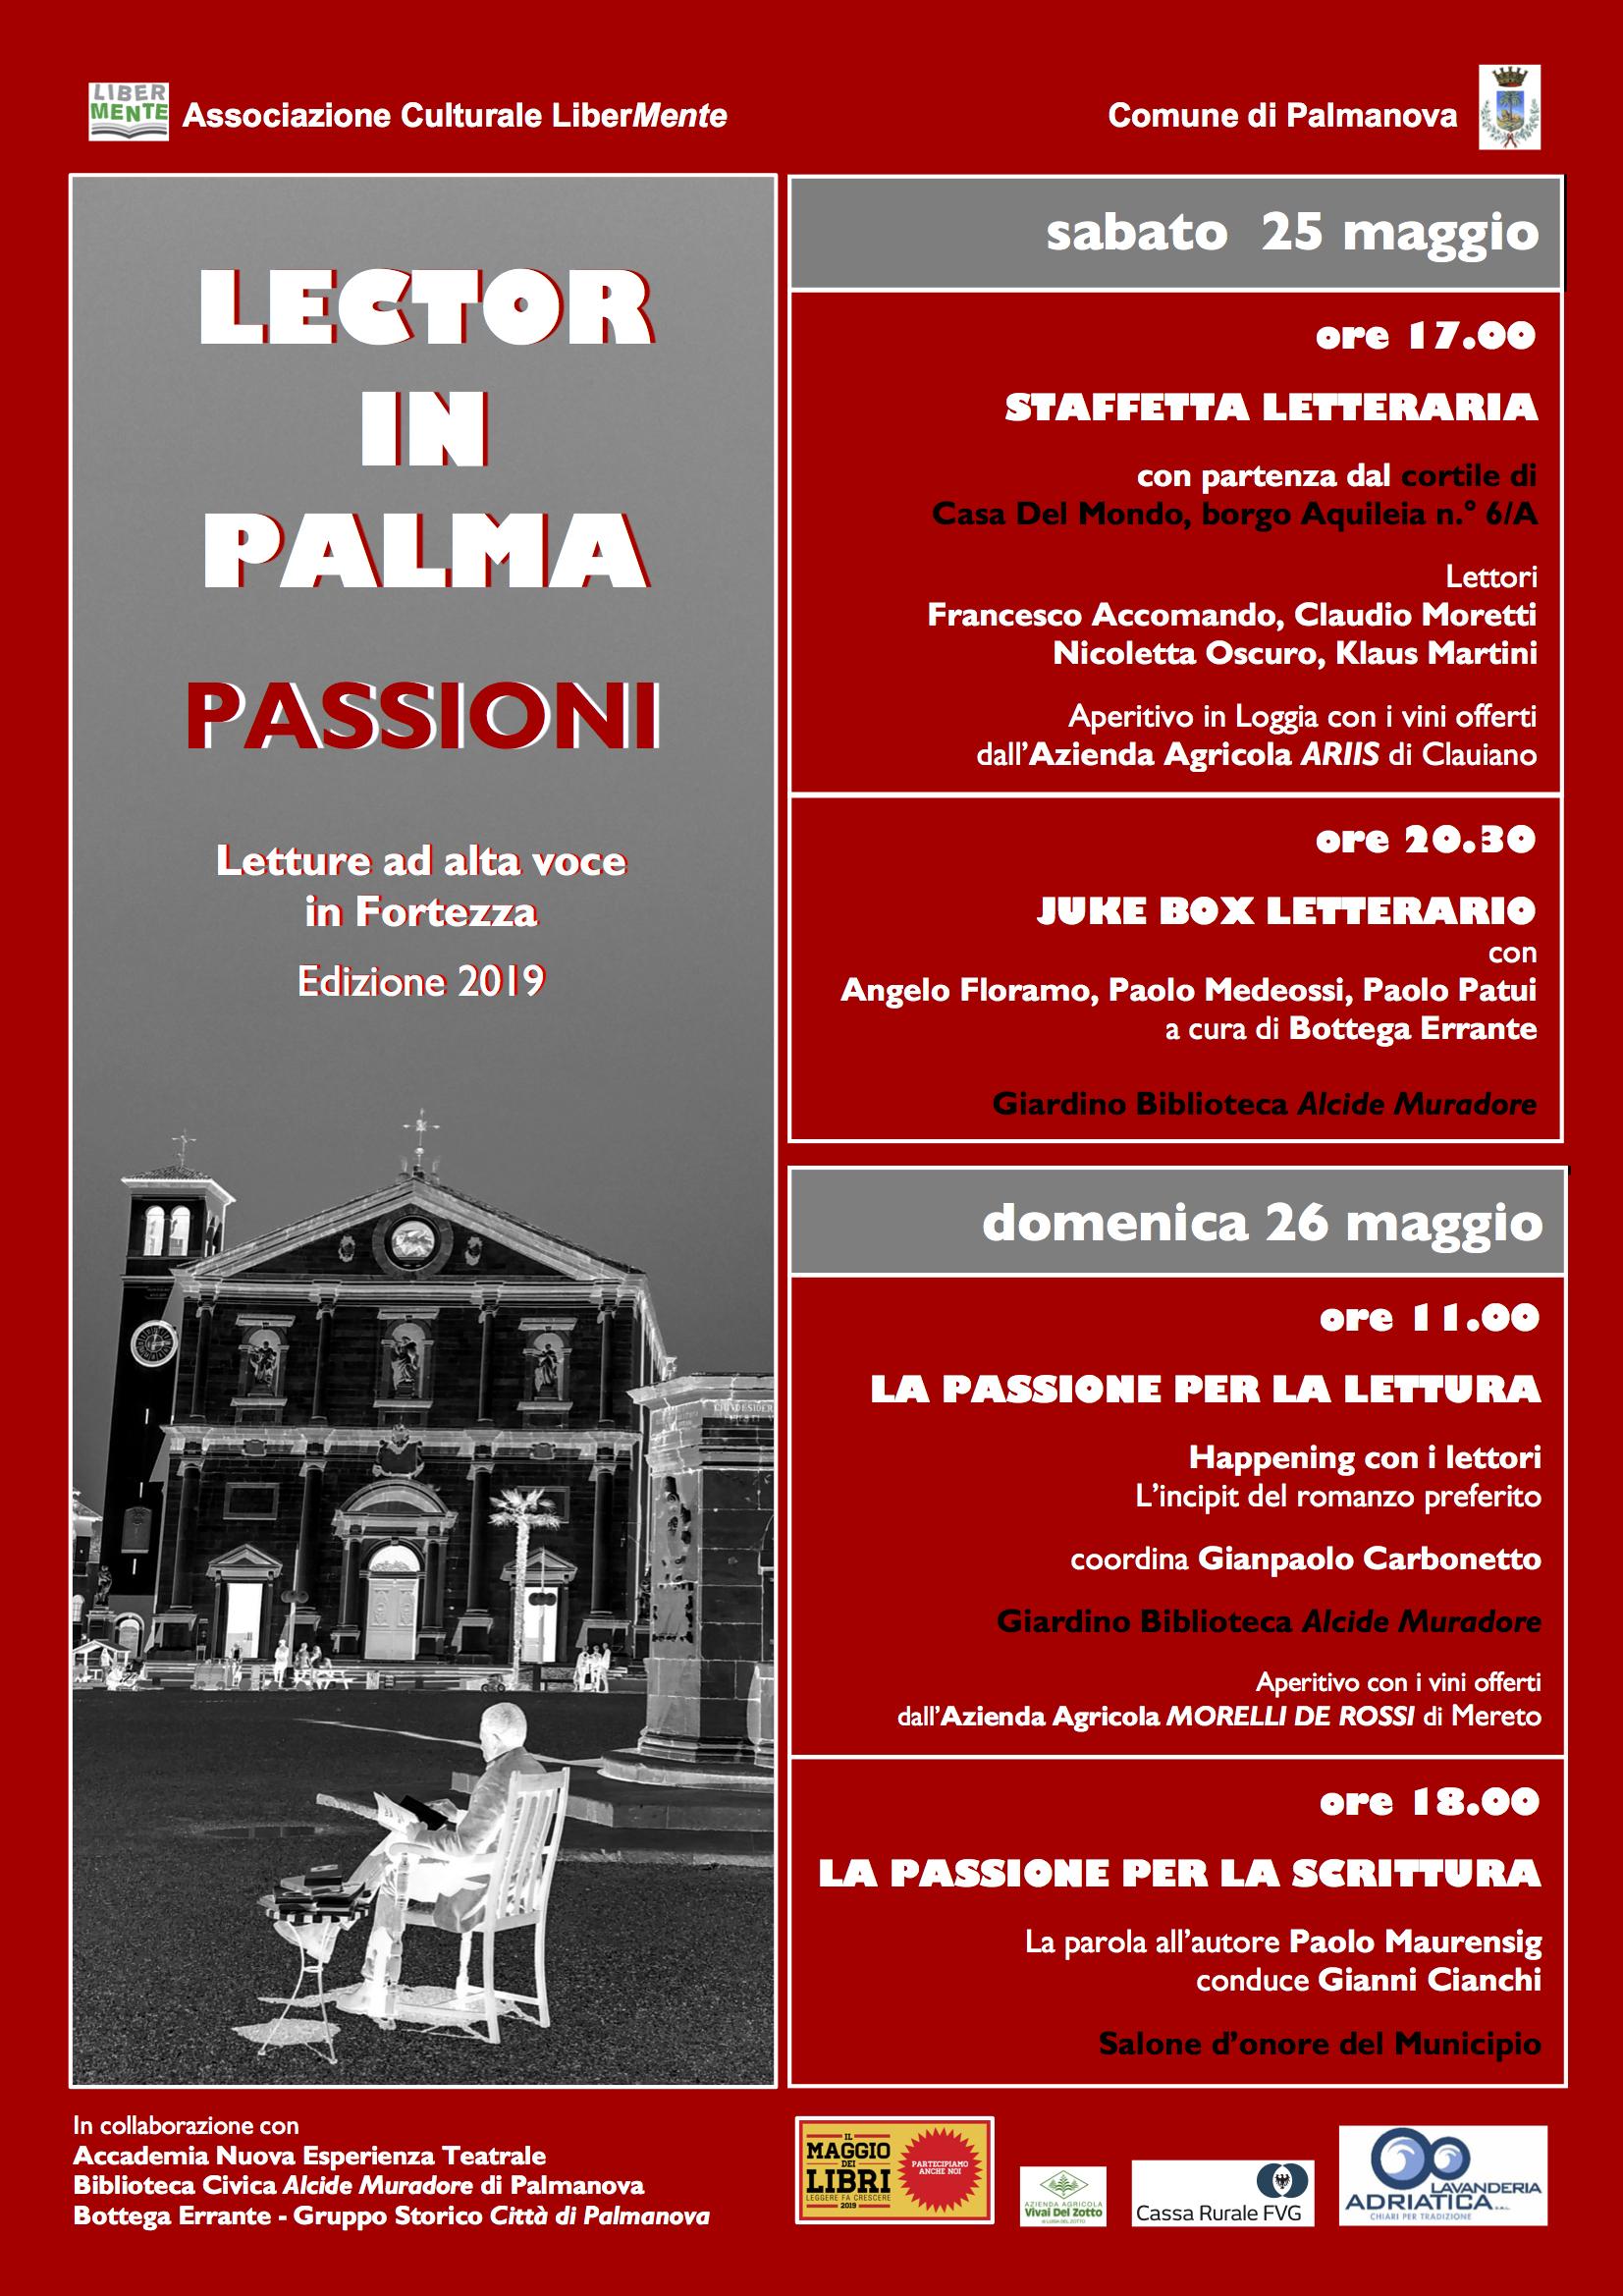 Loc. Lector in Palma 2019 x fb